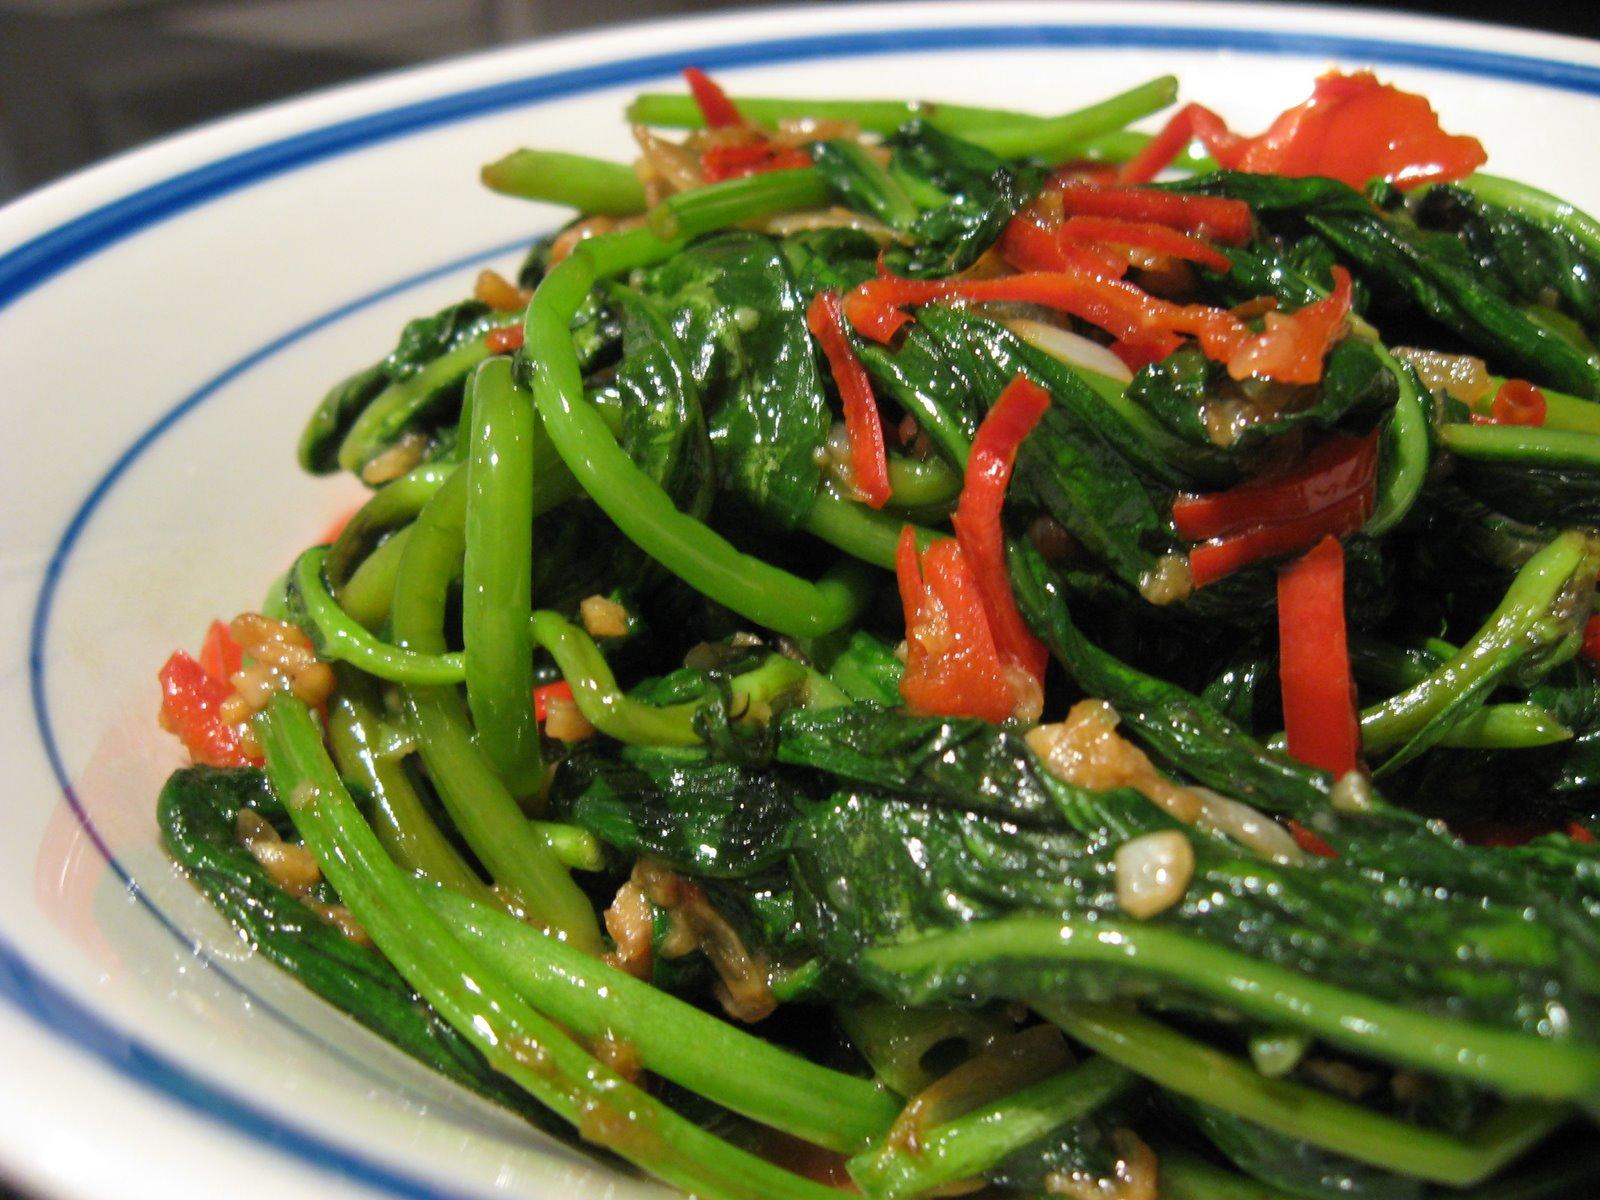 medicinal benefits of kangkung with image p1 works